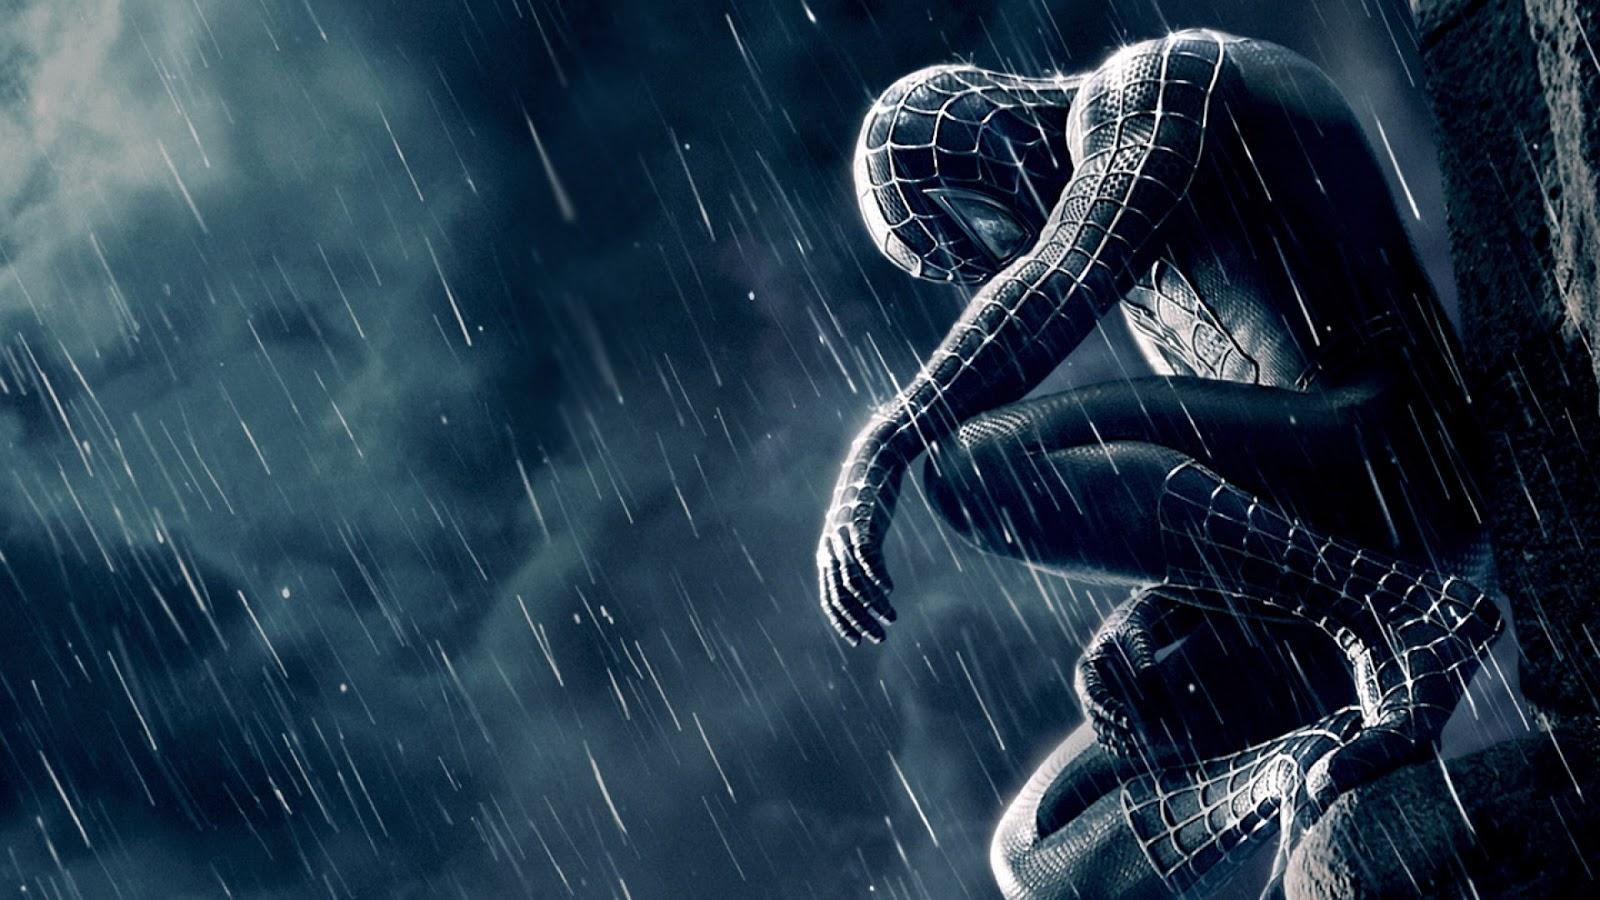 HD Wallpaper of Spiderman 1080p